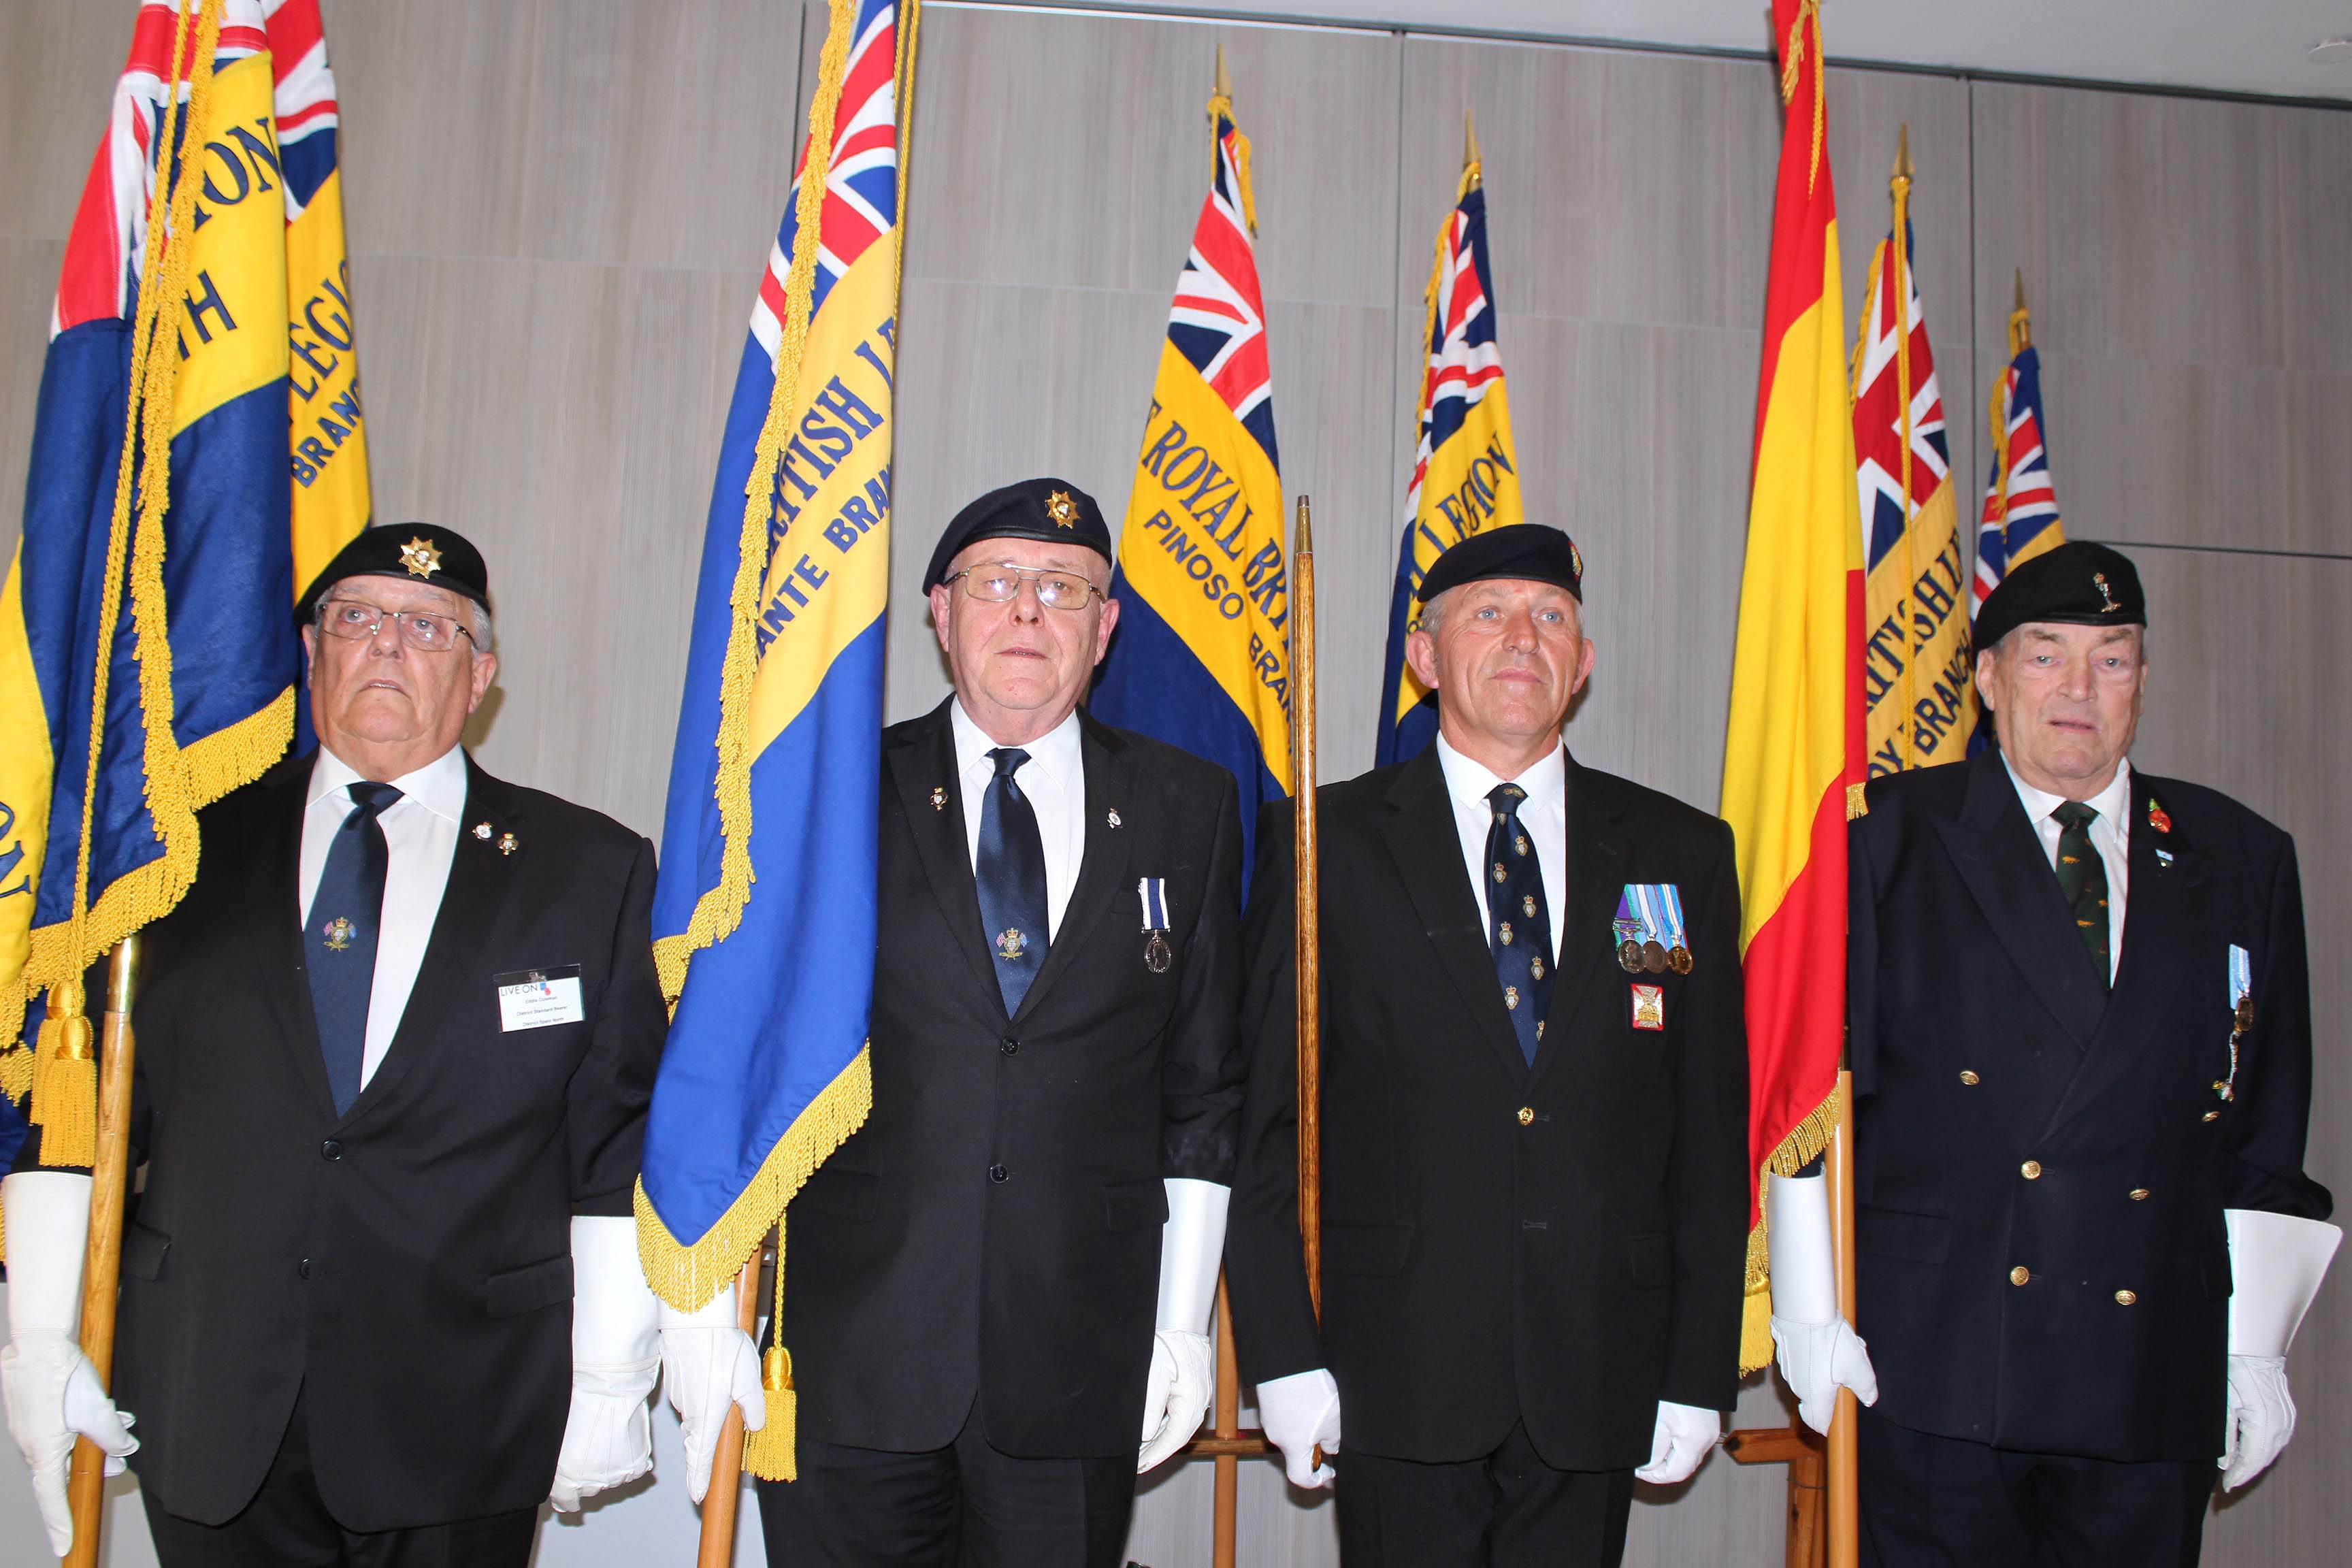 Standard Bearers with Parade Marshall